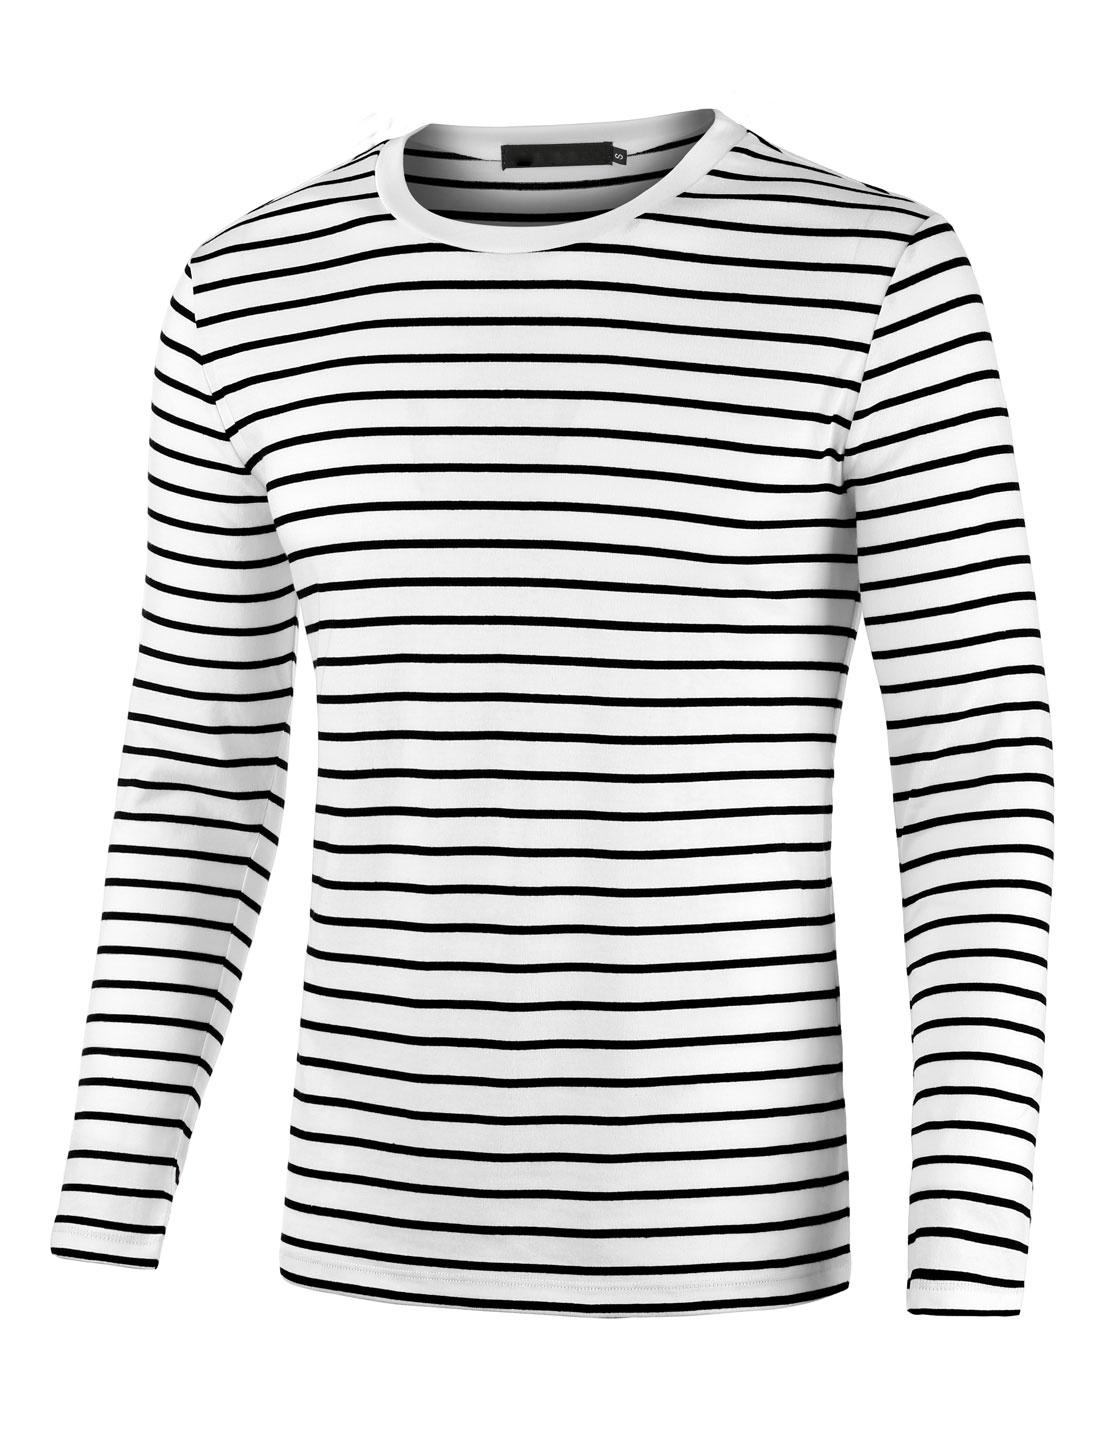 Men Crew Neck Long Sleeve Striped Tee T Shirt Black XL XL (US 46)